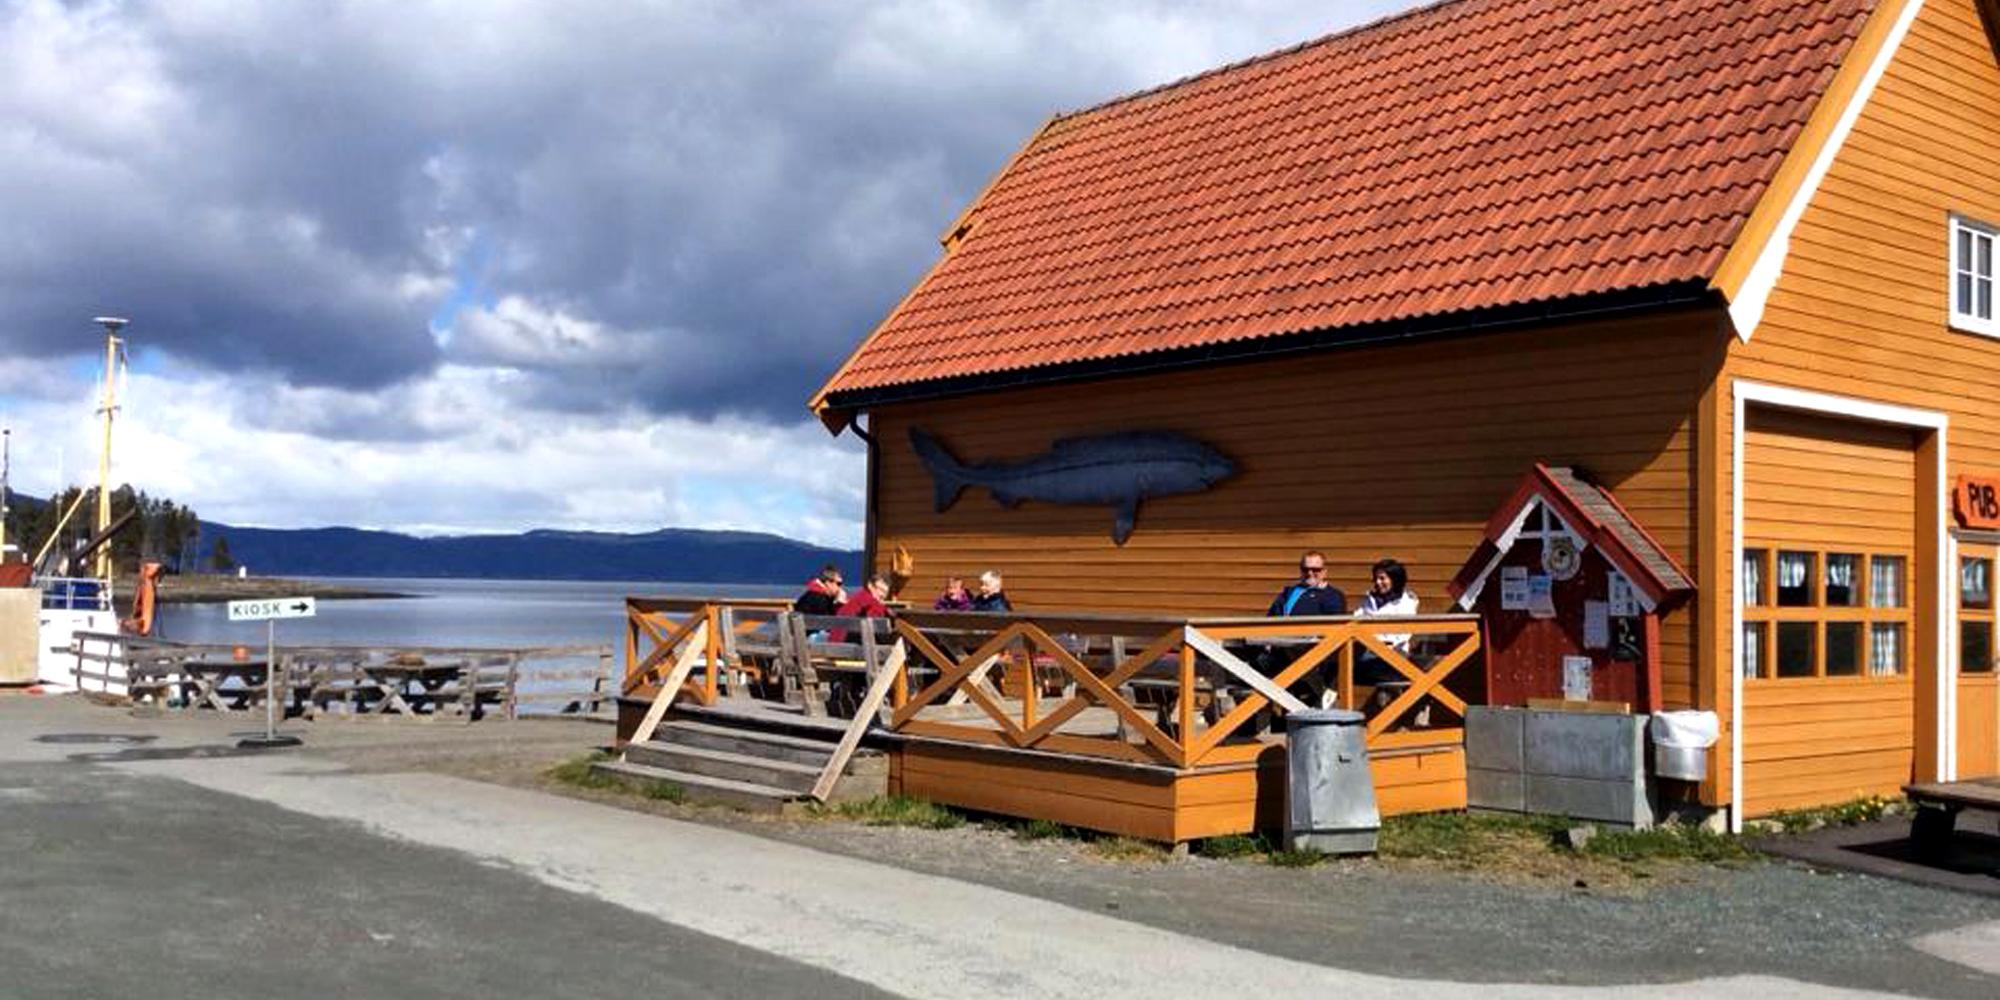 Matservering i sommersesongen. Copyright: Kjrknesvågen Kai og Båtforening